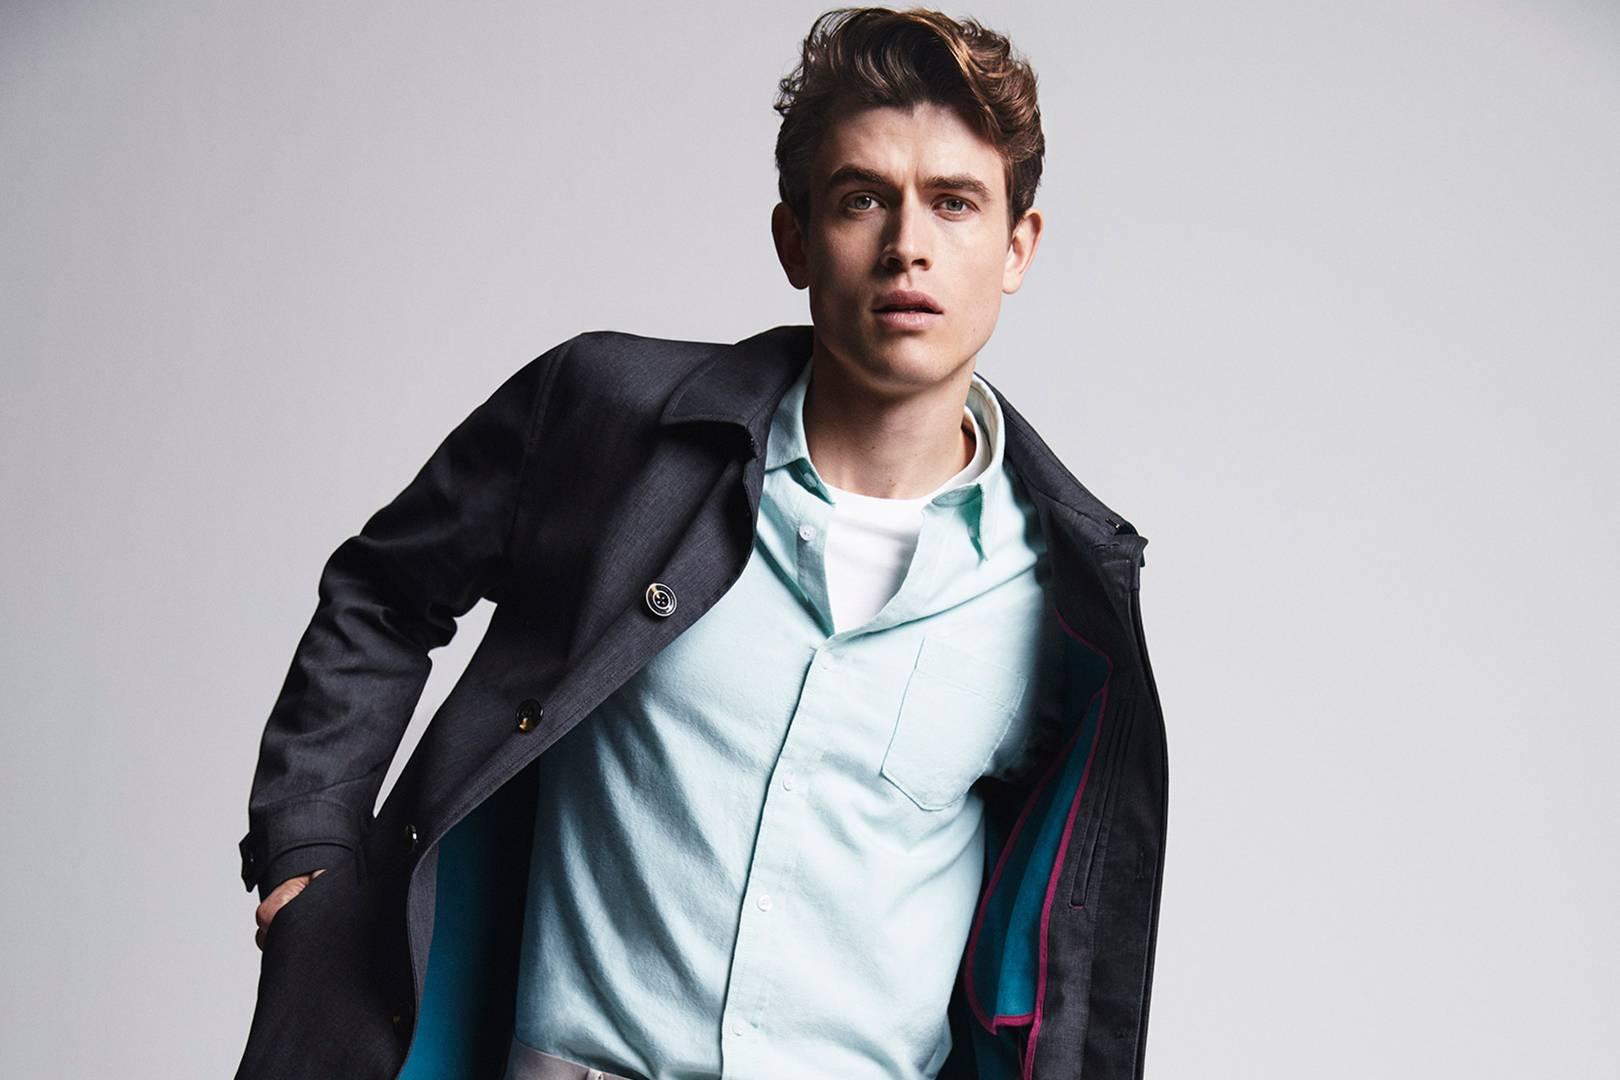 John Lewis Announces New Menswear Brands